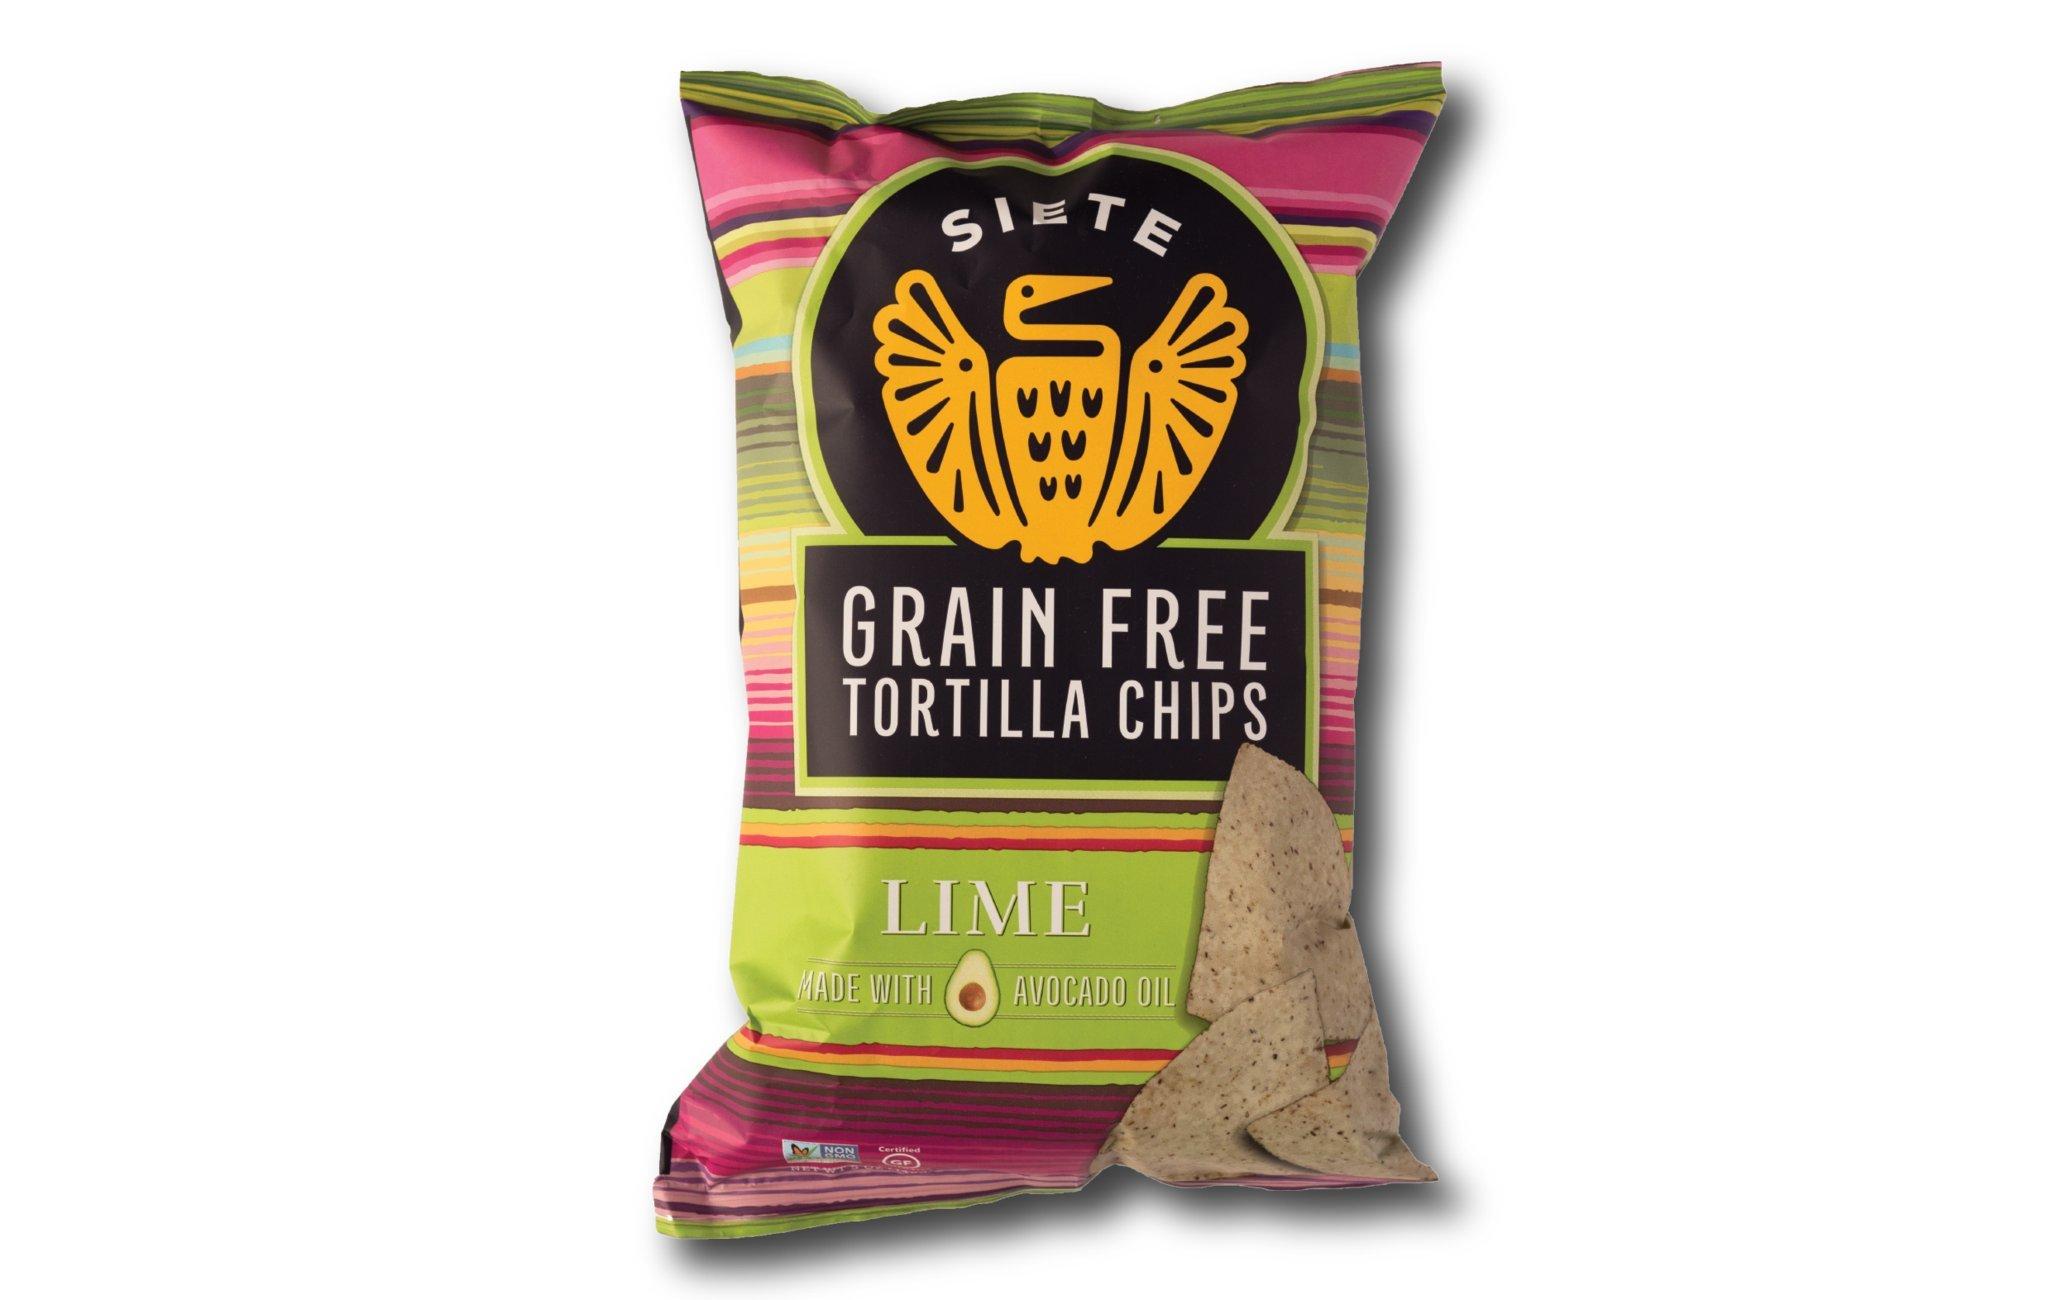 Siete Grain Free Tortilla Chips, Lime, 5 oz